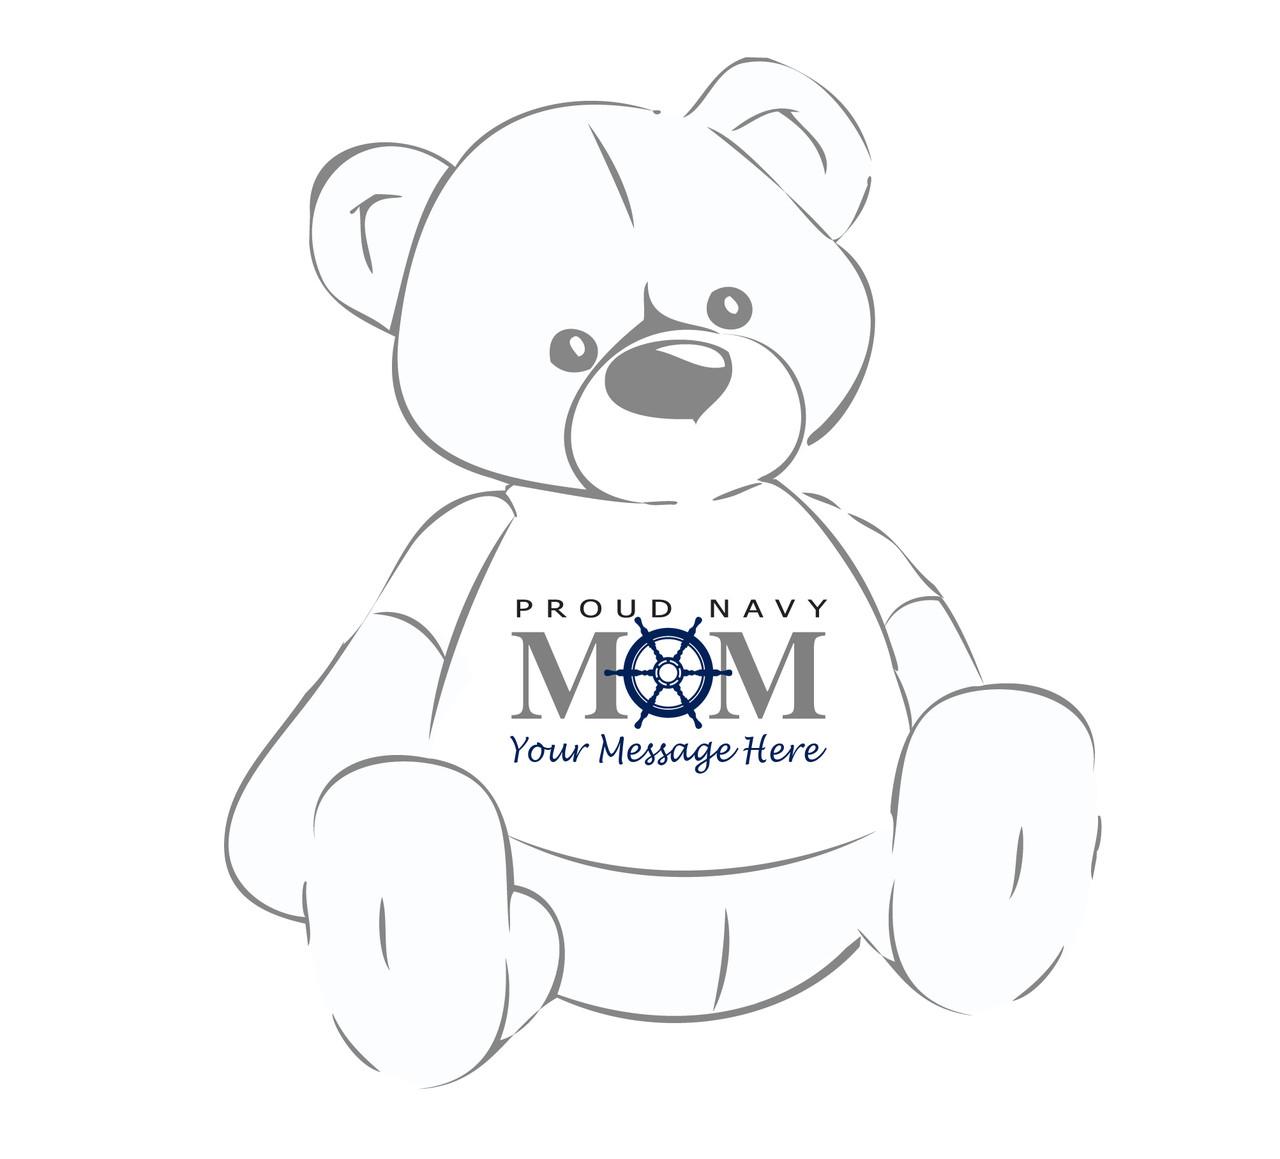 Personalized Proud Navy Mom Ship's Wheel Giant Teddy Bear shirt